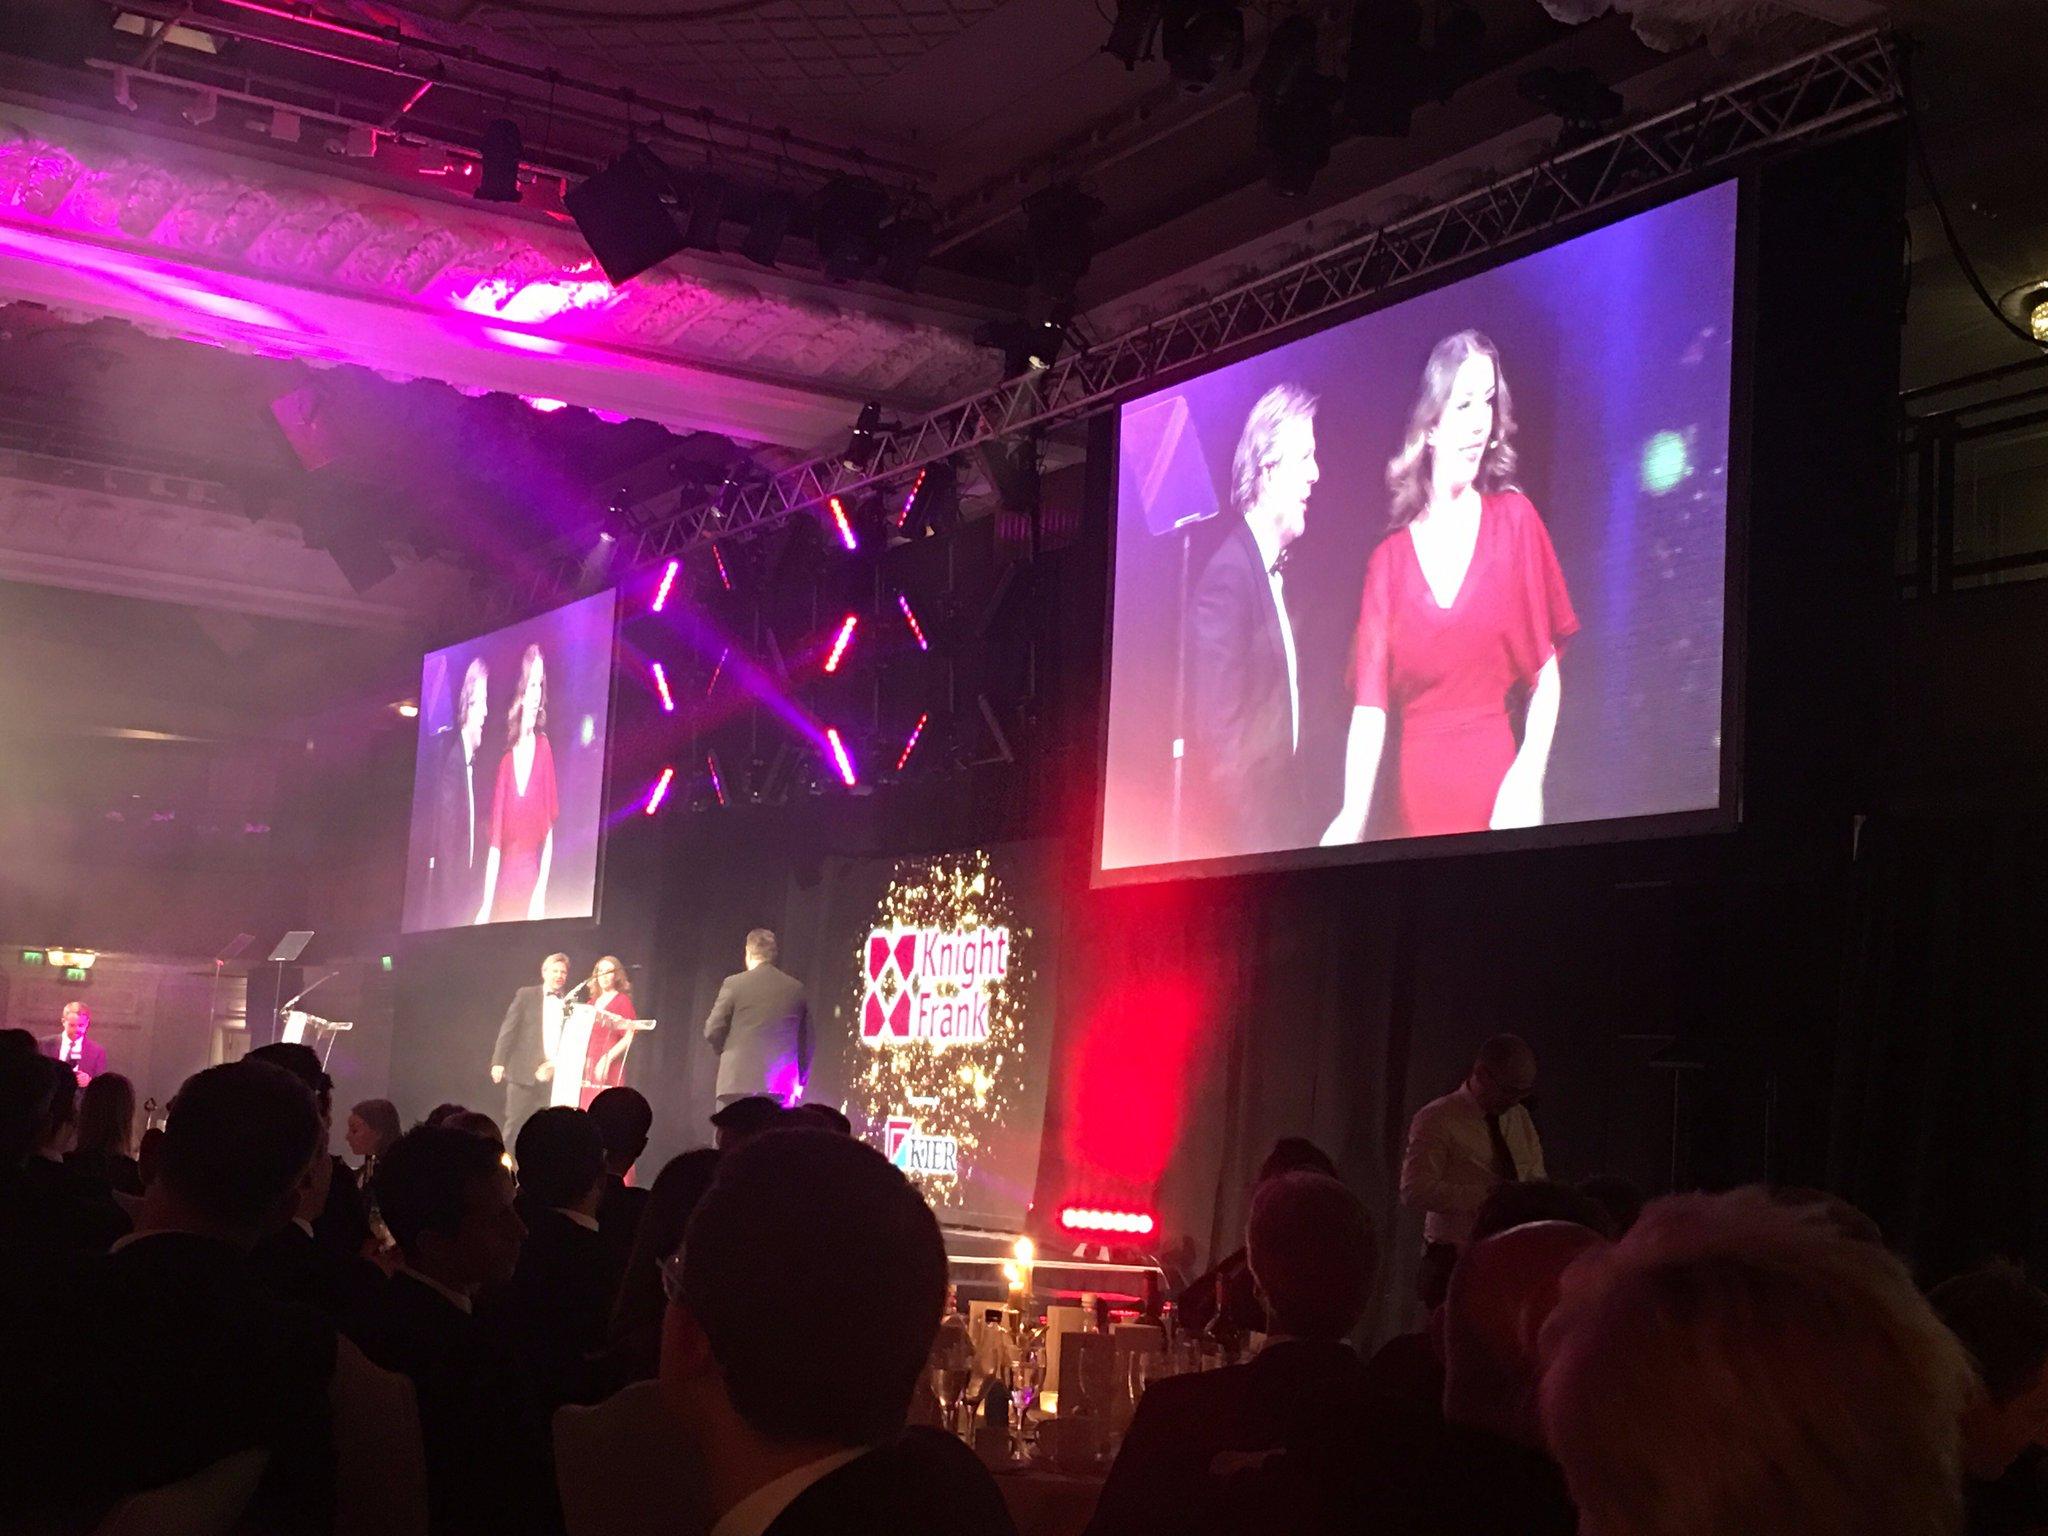 Congratulations @knightfrank on winning 'Industrial Advisor of the year' #EGAwards17 @EstatesGazette https://t.co/hKbMgju54x